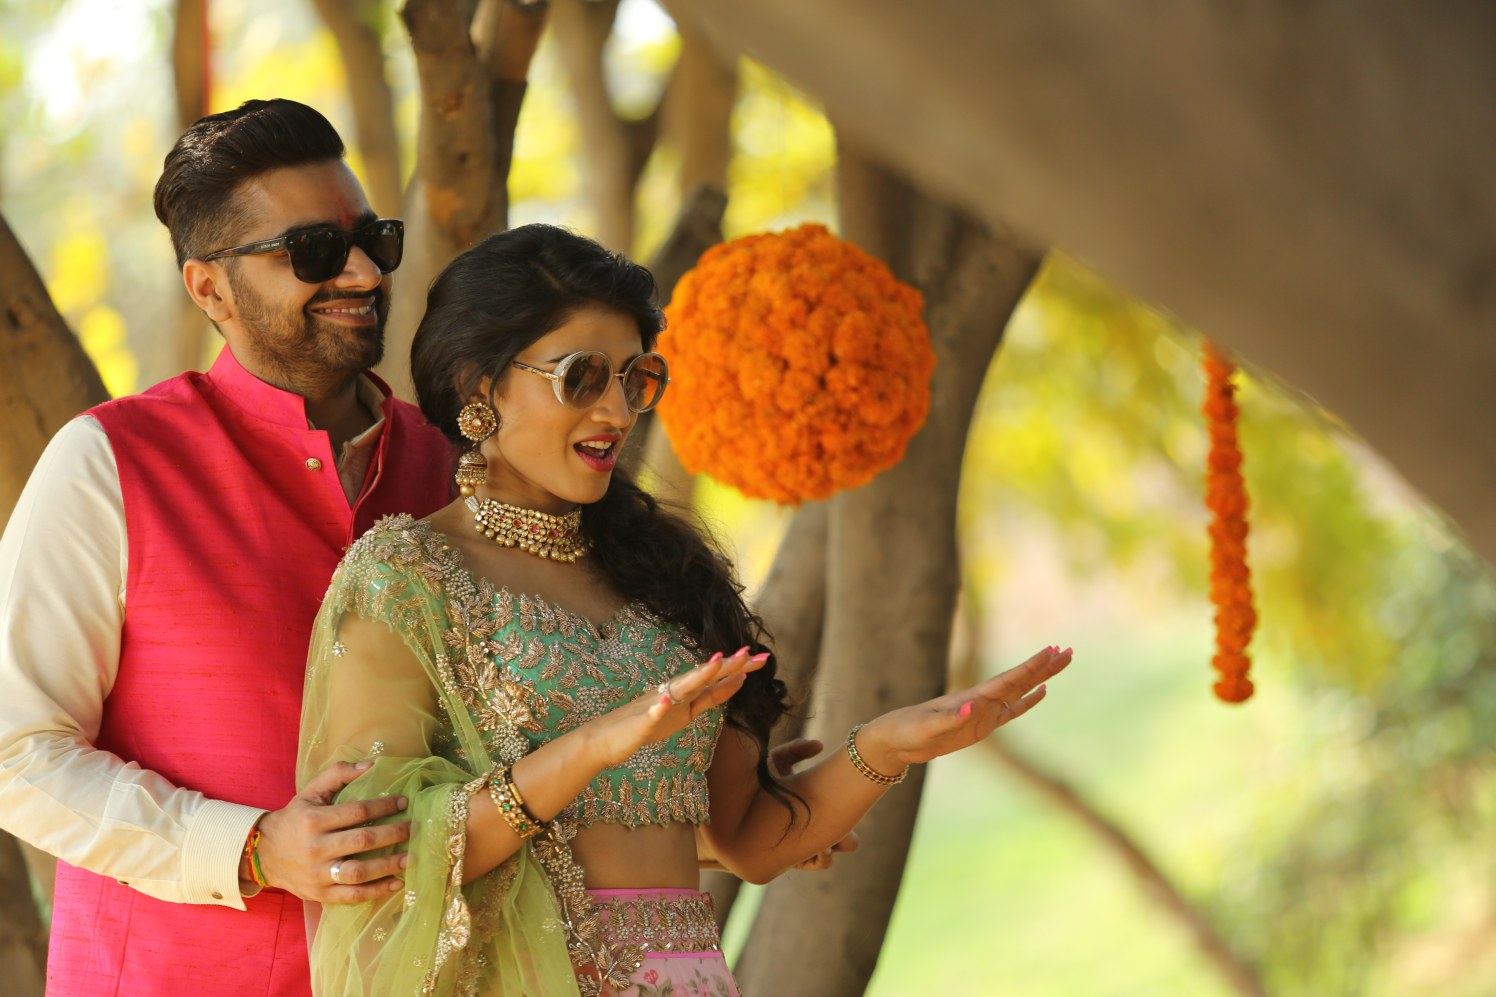 Perfect Marigold Floral Decor For Engagement Day by Amit Kumar Wedding-photography Wedding-decor | Weddings Photos & Ideas